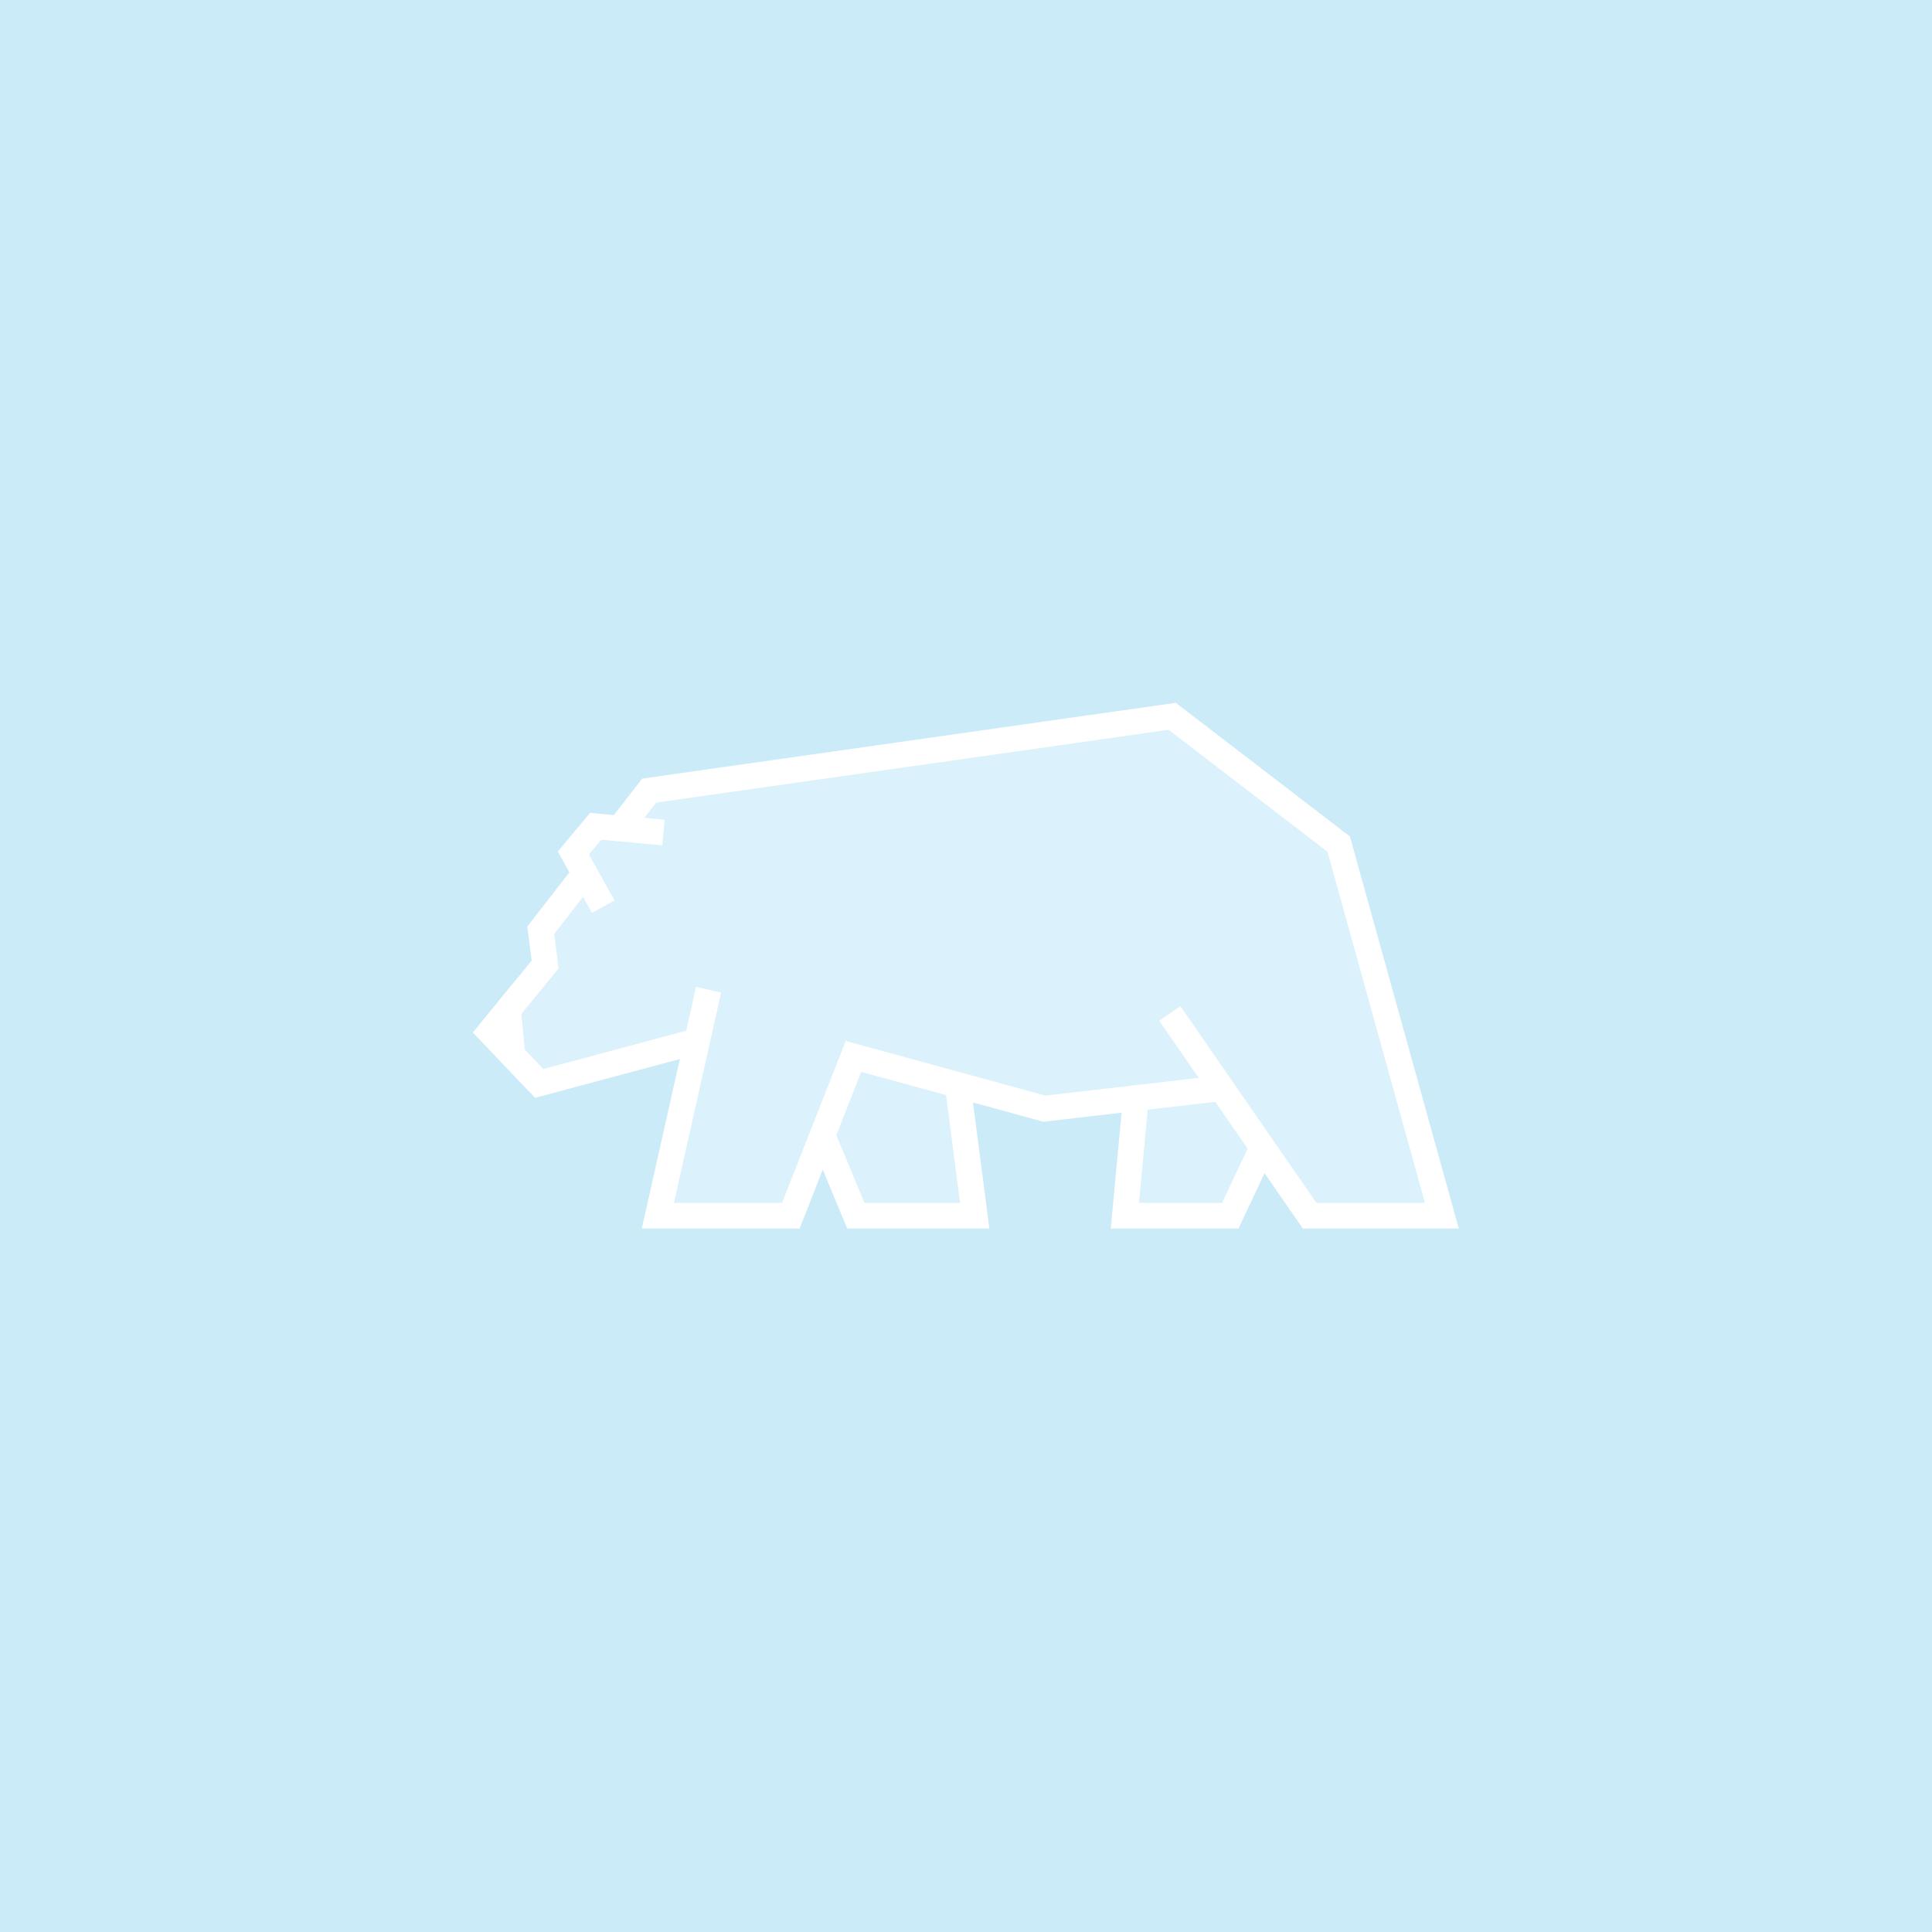 052-polarBear-52